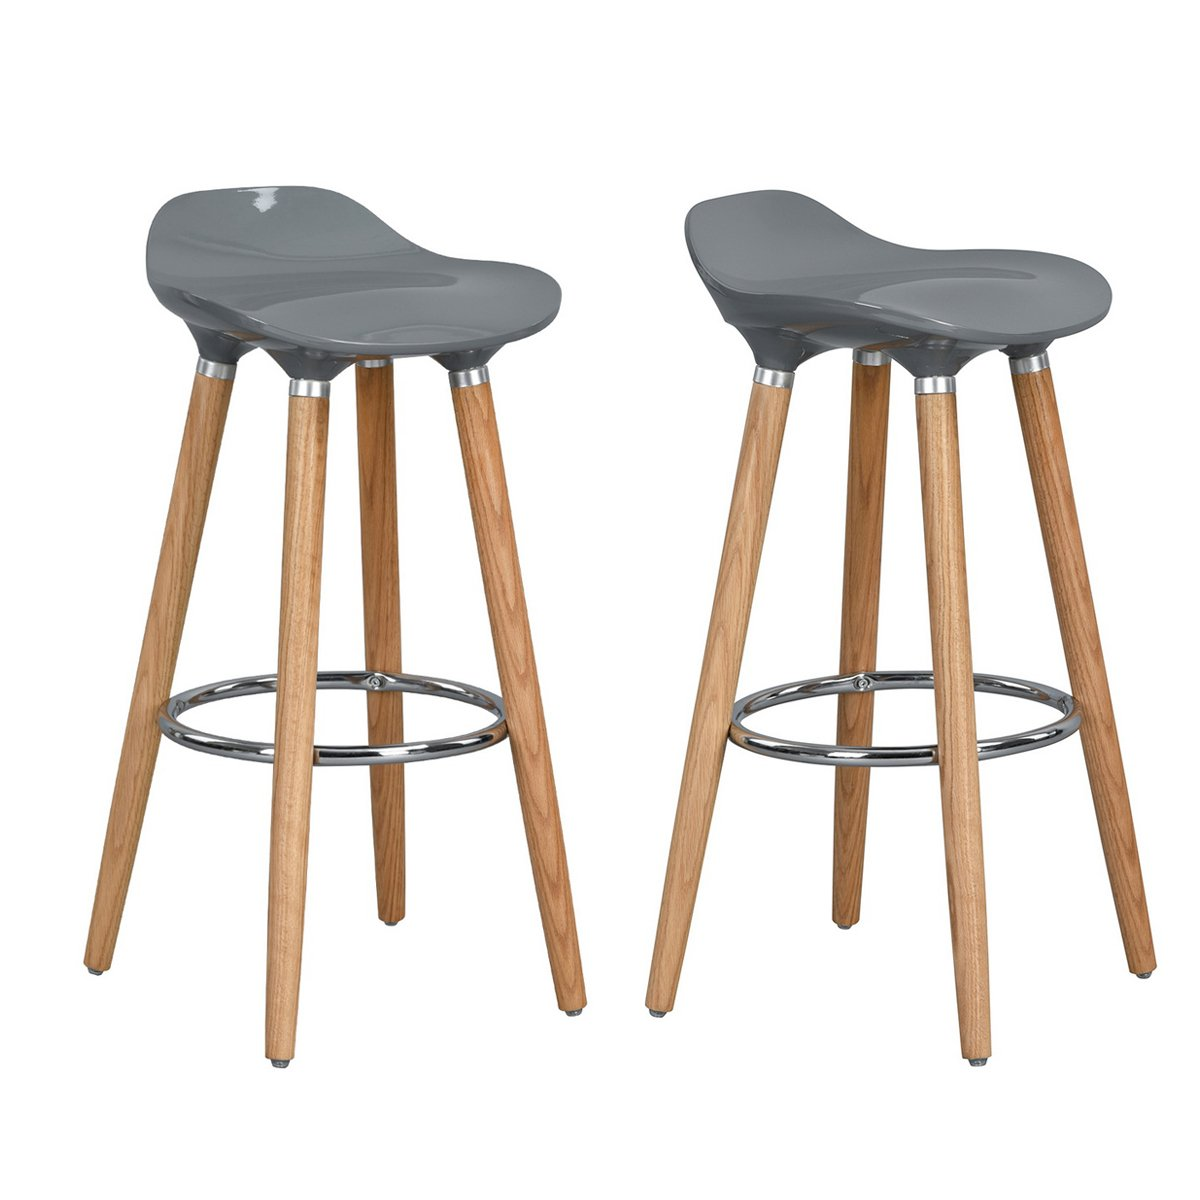 Amazoncom Homy Casa Barstools Set Of 2 Backless 30 Inch Bar Chair